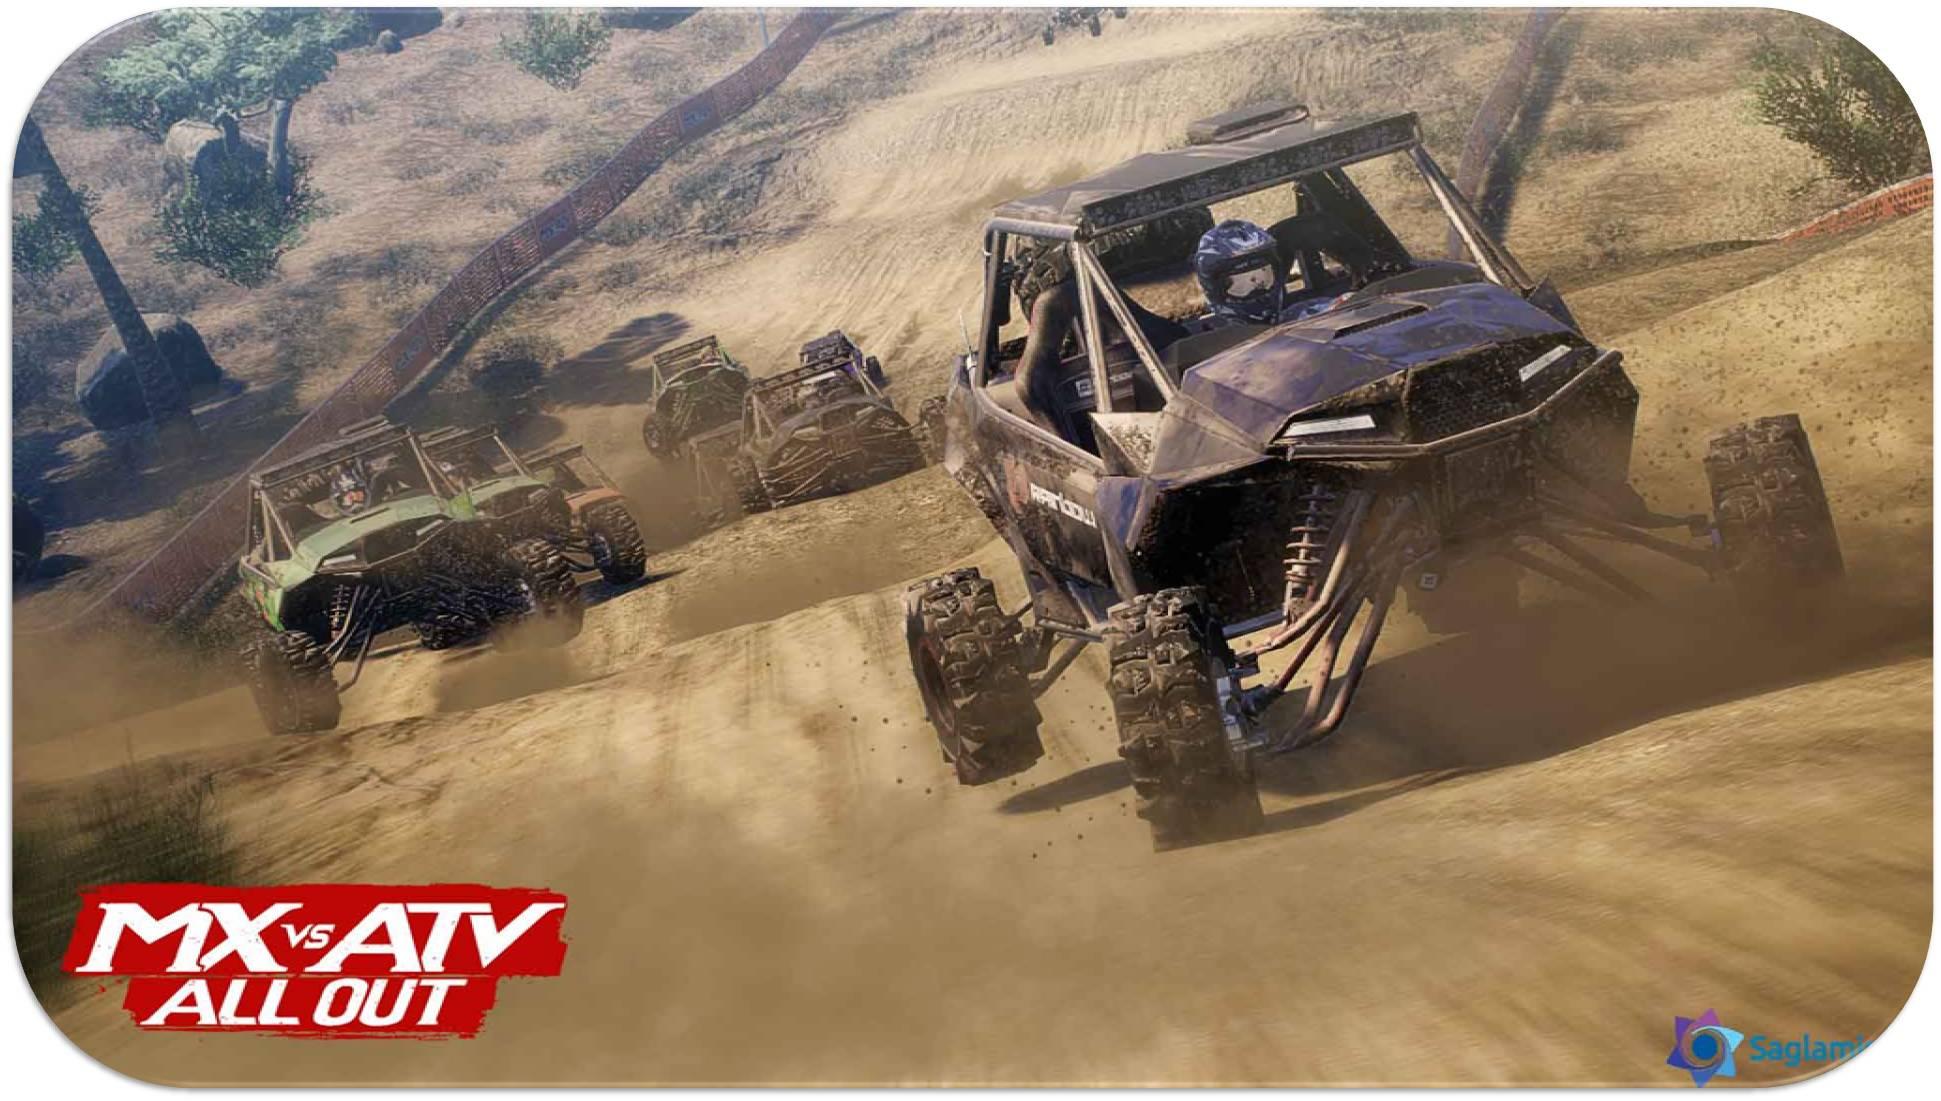 MX vs ATV All Out saglamindir